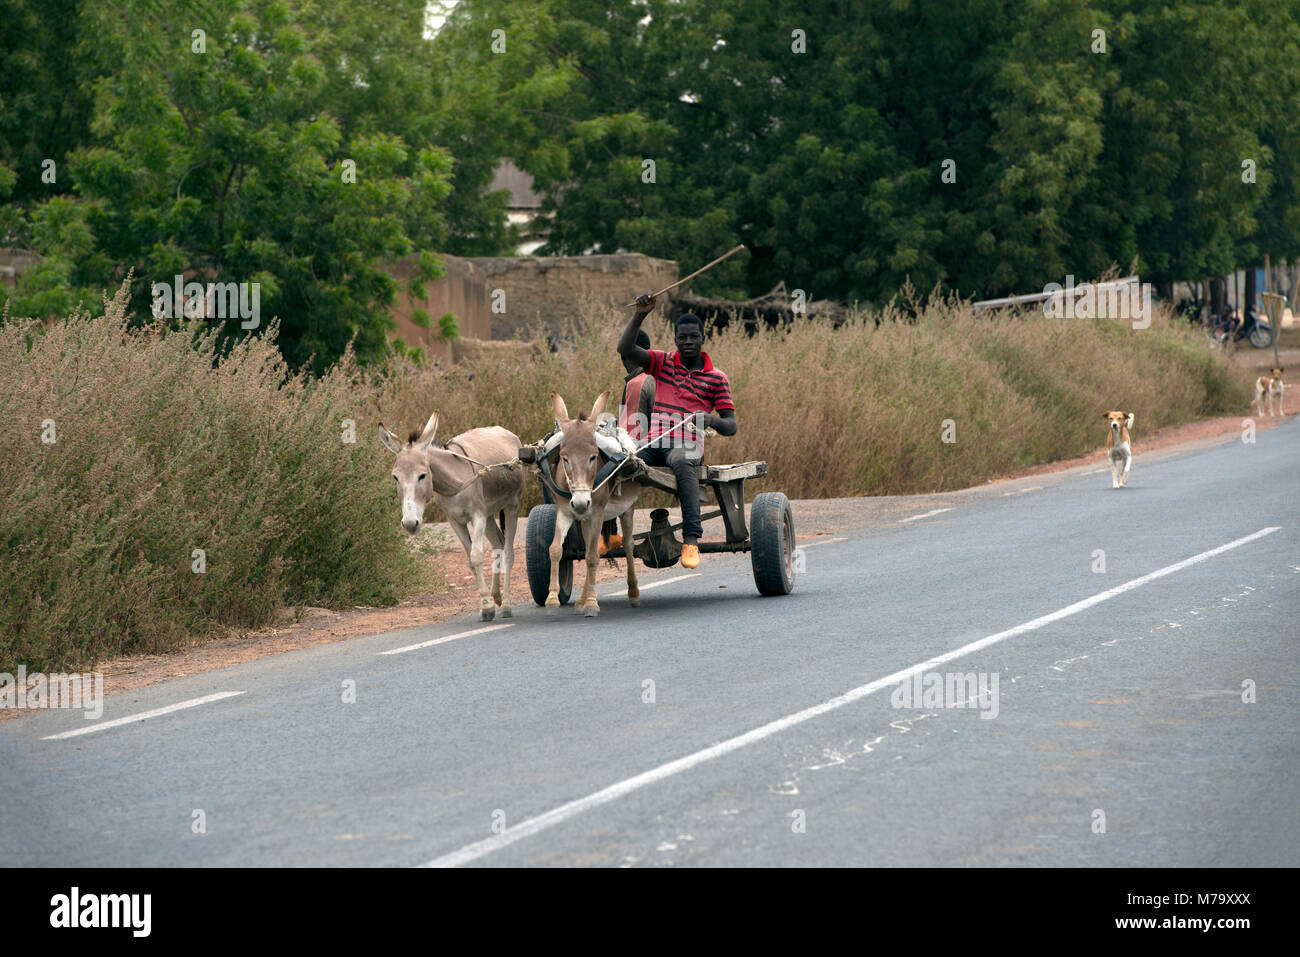 Men riding a donkey cart along the road. Mopti Region, Mali, West Africa. - Stock Image